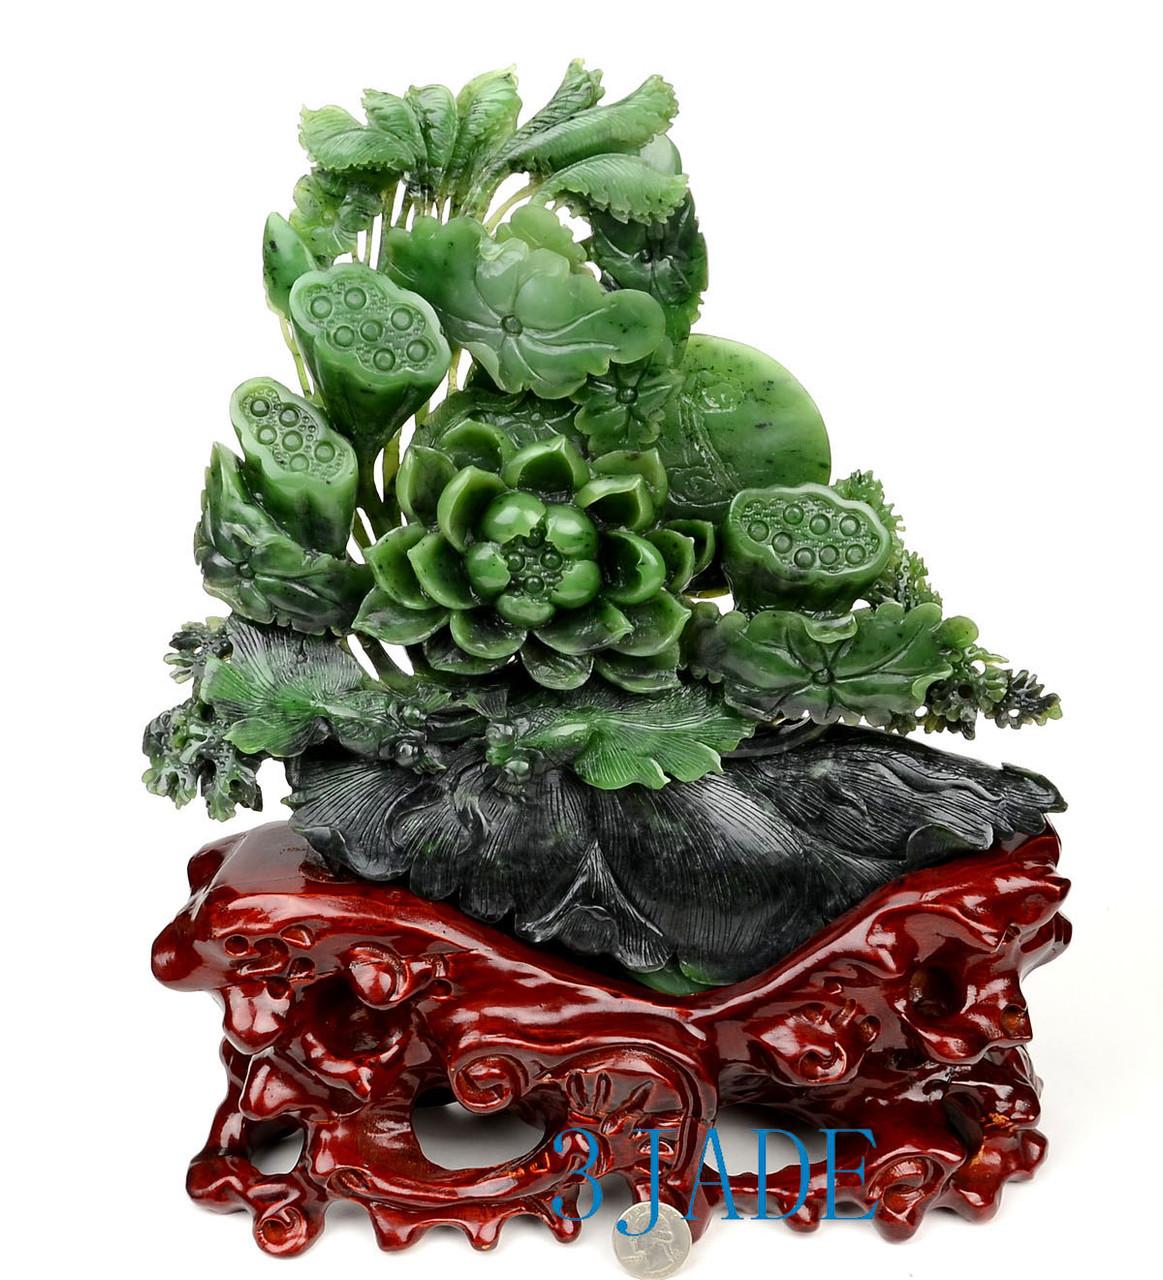 Green Nephrite Jade Lotus Seed Pod/Flower & Fish Sculpture